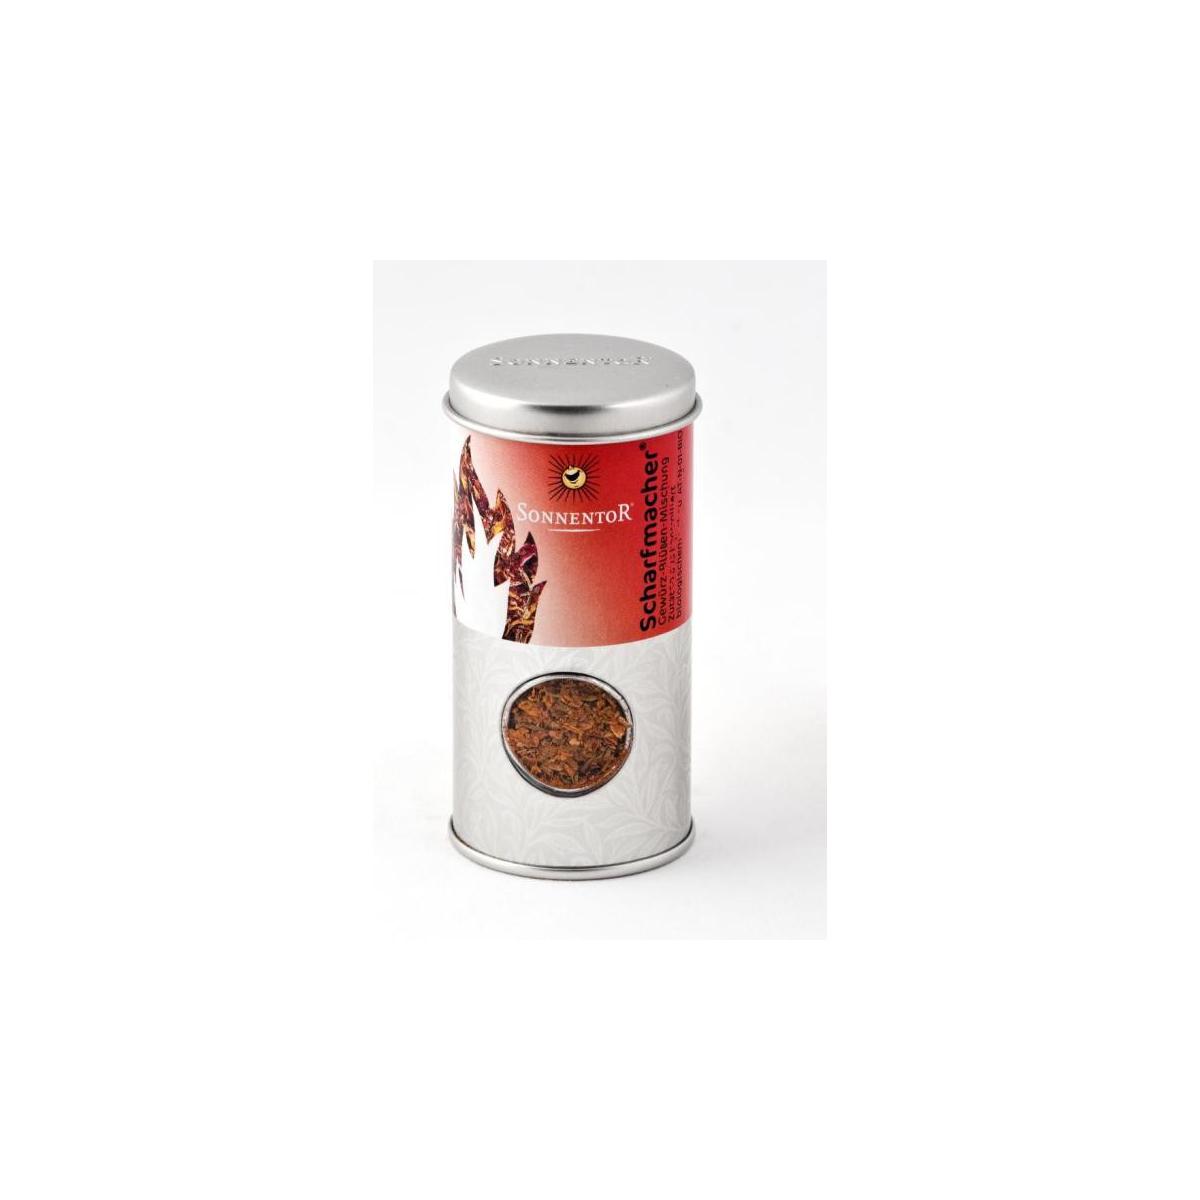 Scharfmacher Gewürz-Blüten-Mischung Streudose